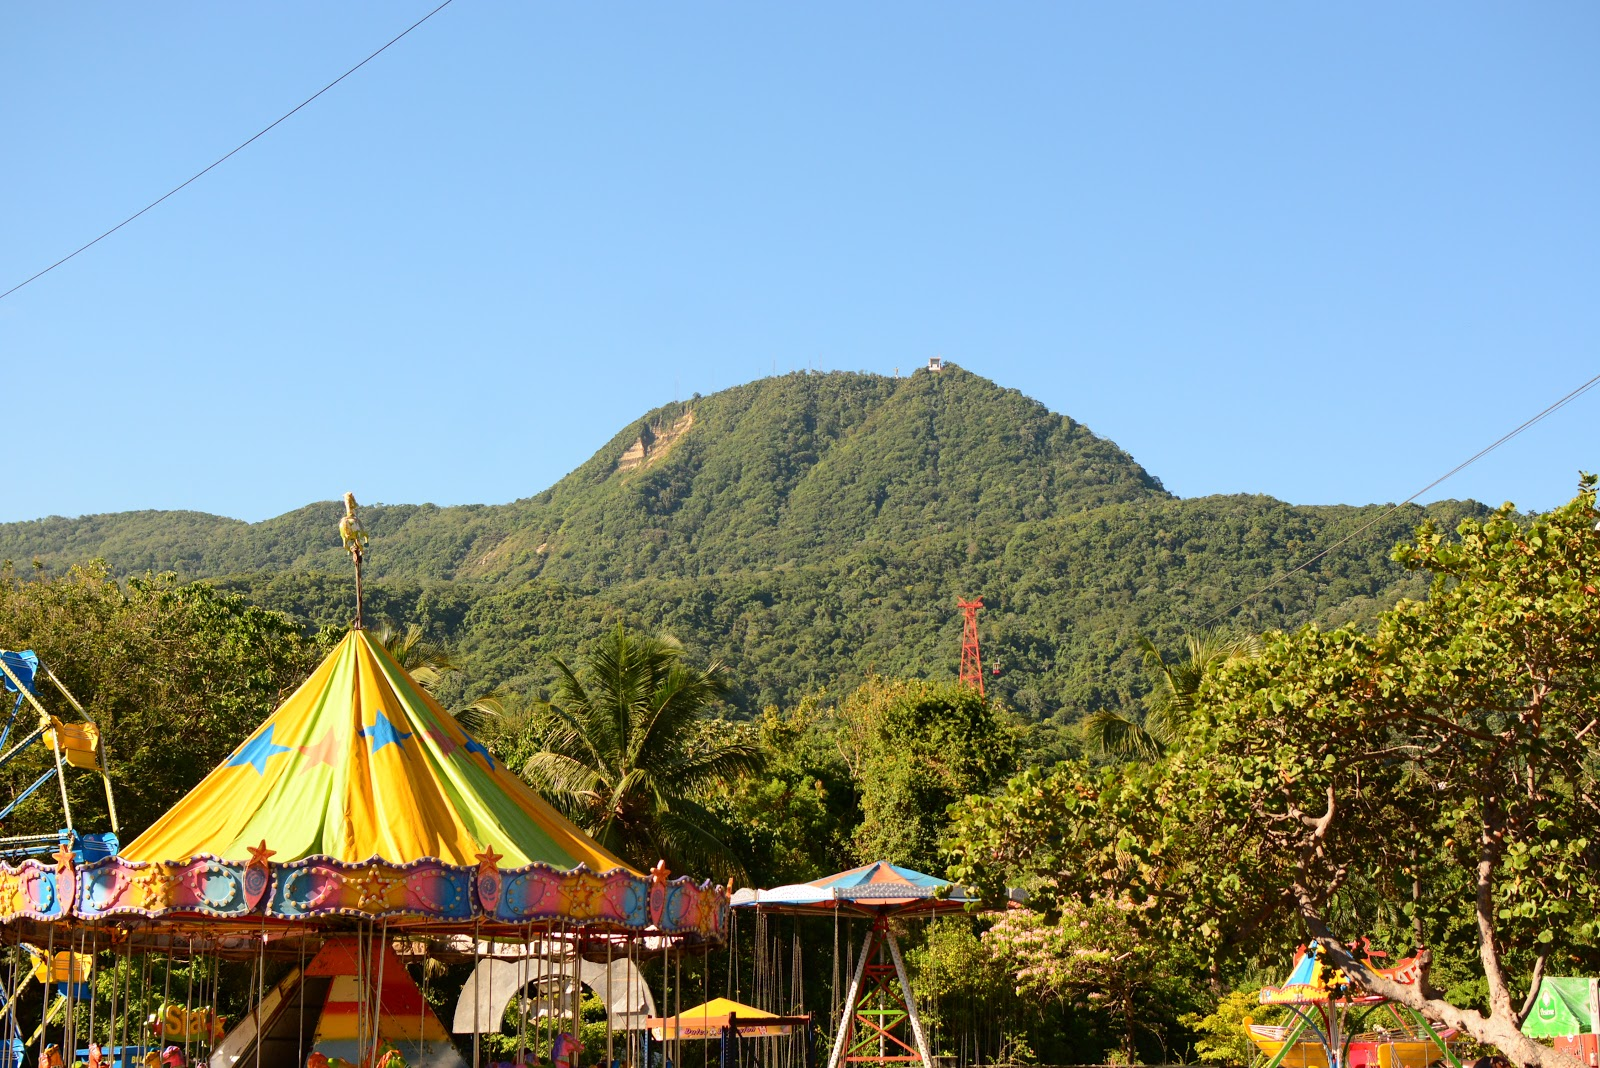 climbing, hiking, trekking, training, mountain, dominican republic, holiday, riu bachata, puerto plata